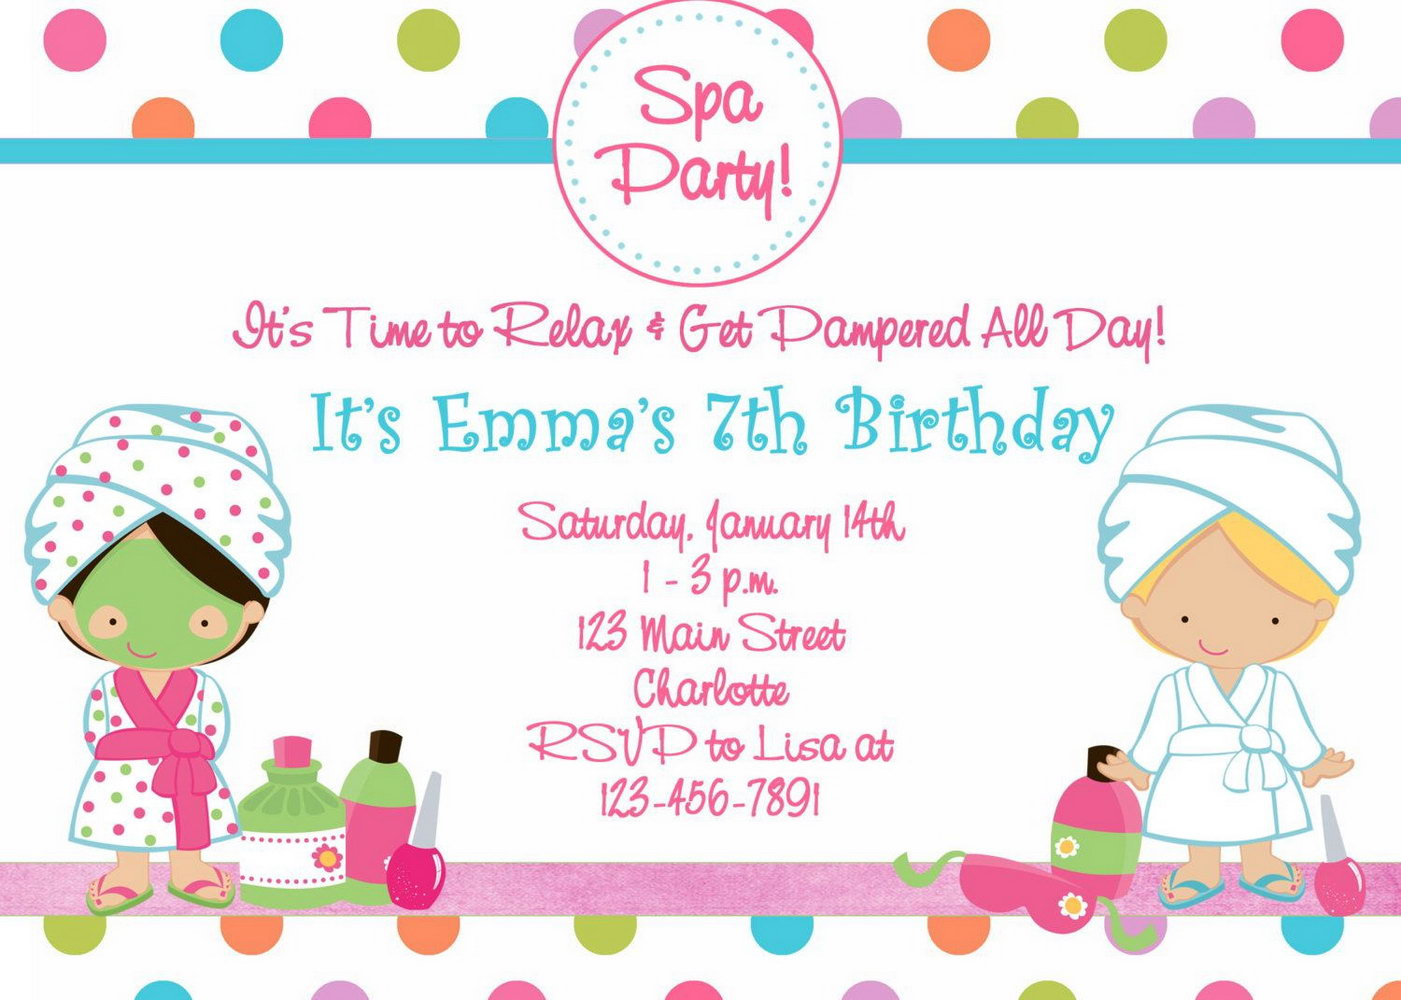 Spa Birthday Invitation Template Free